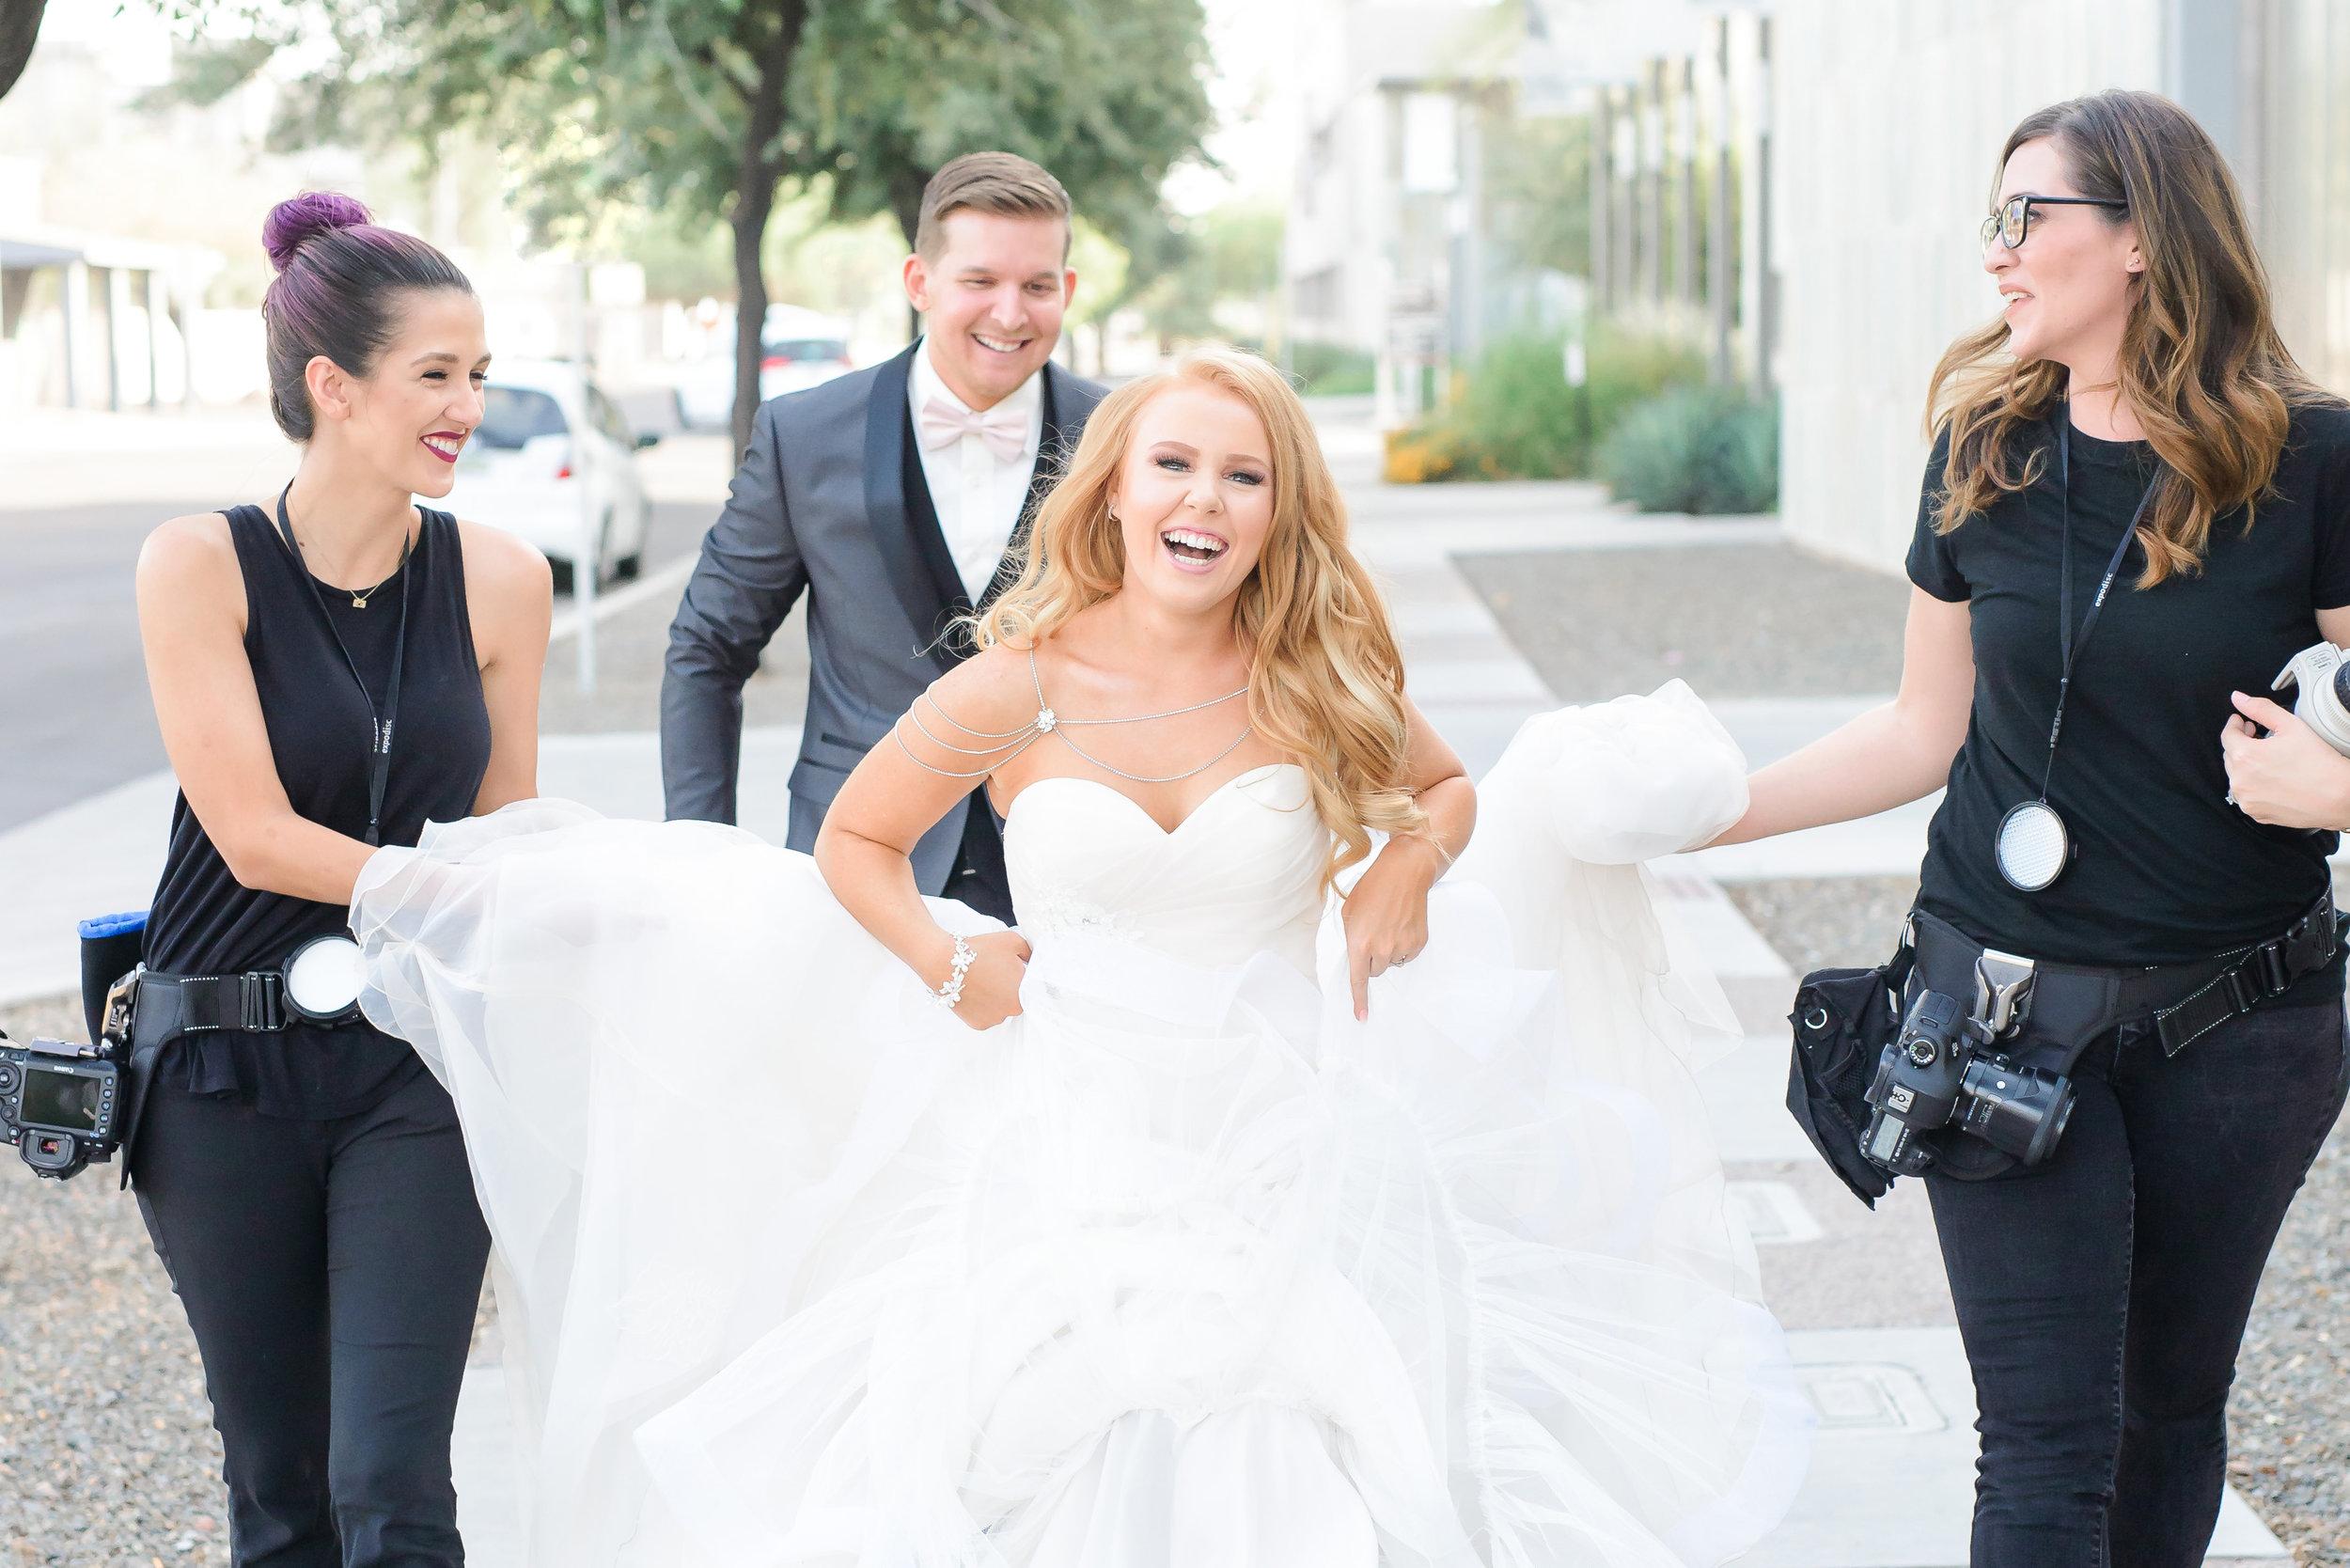 Photography & Videography - Depoy StudiosMonique Hessler WeddingsStep on Me PhotographySomething New Media Videography